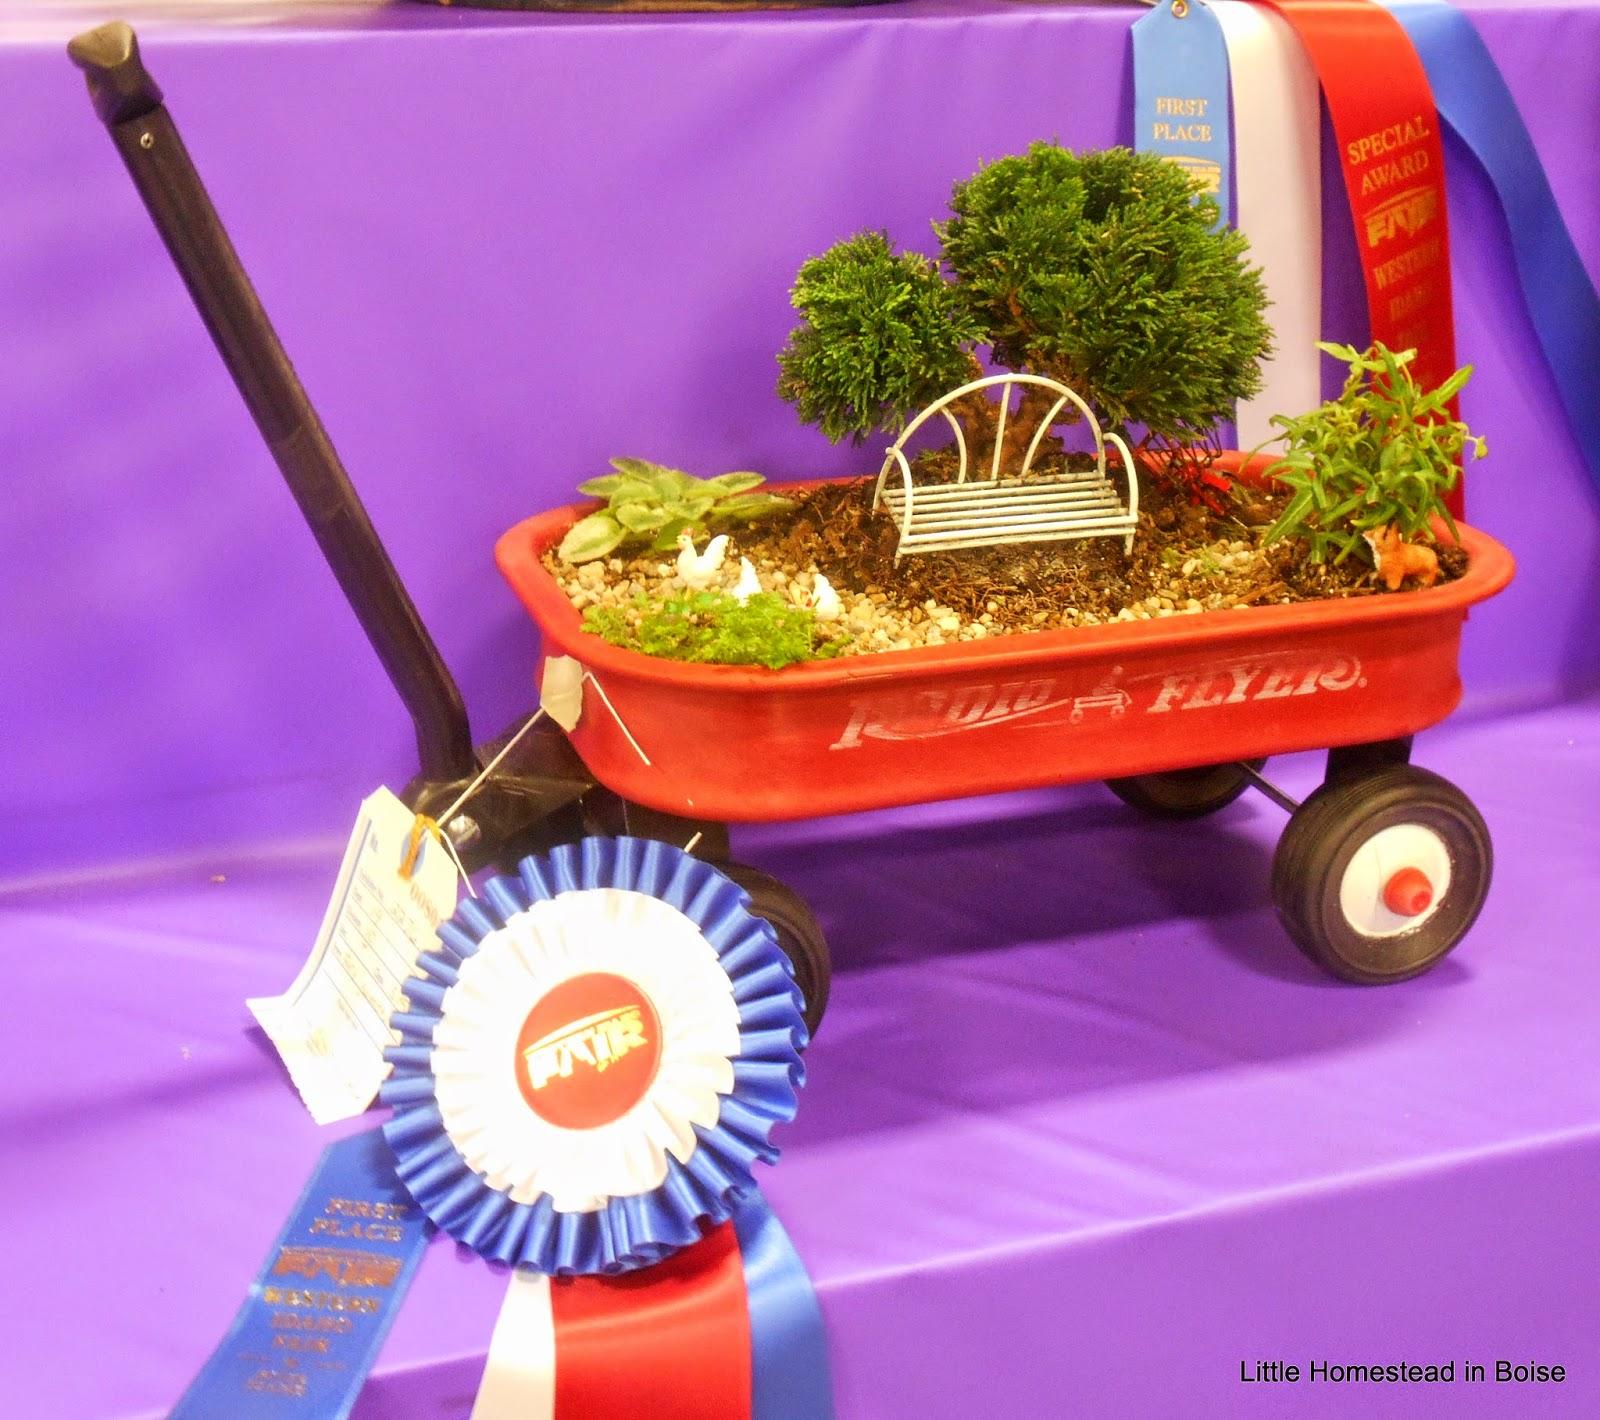 Roses In Garden: Little Homestead In Boise : A Little State Fair Fun